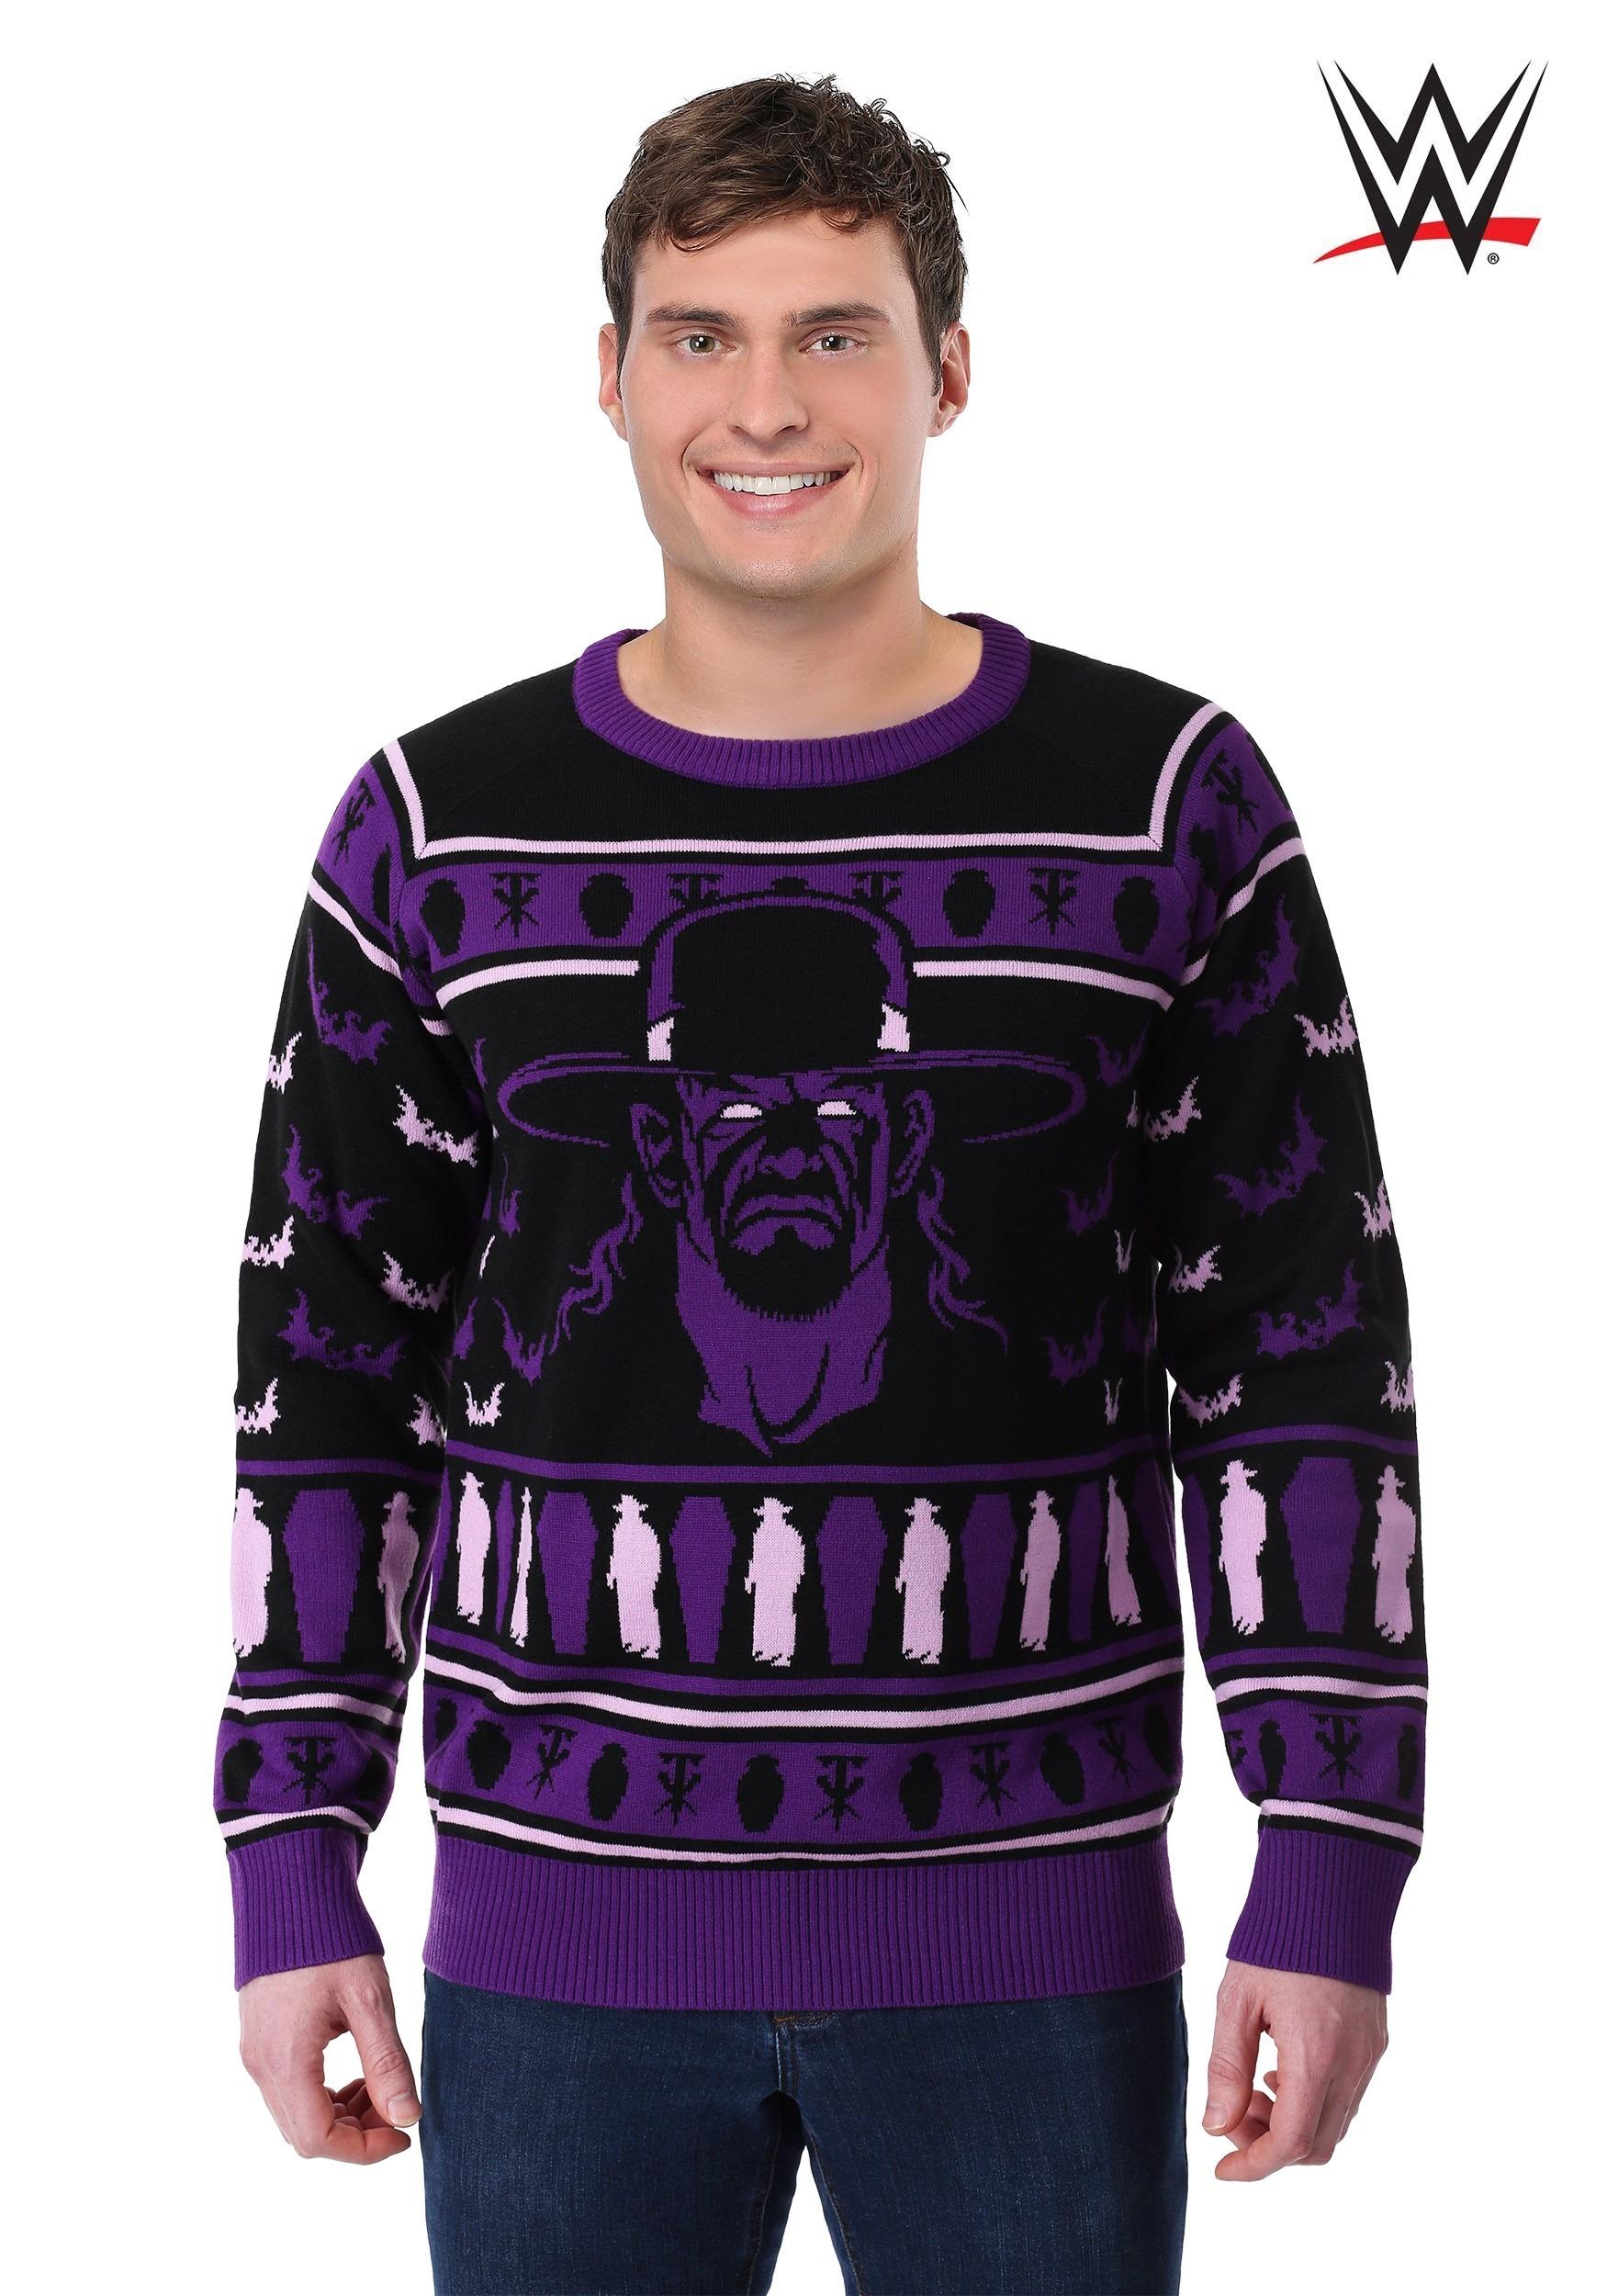 Ugliest Christmas Sweater.Adult Wwe Undertaker Ugly Christmas Sweater